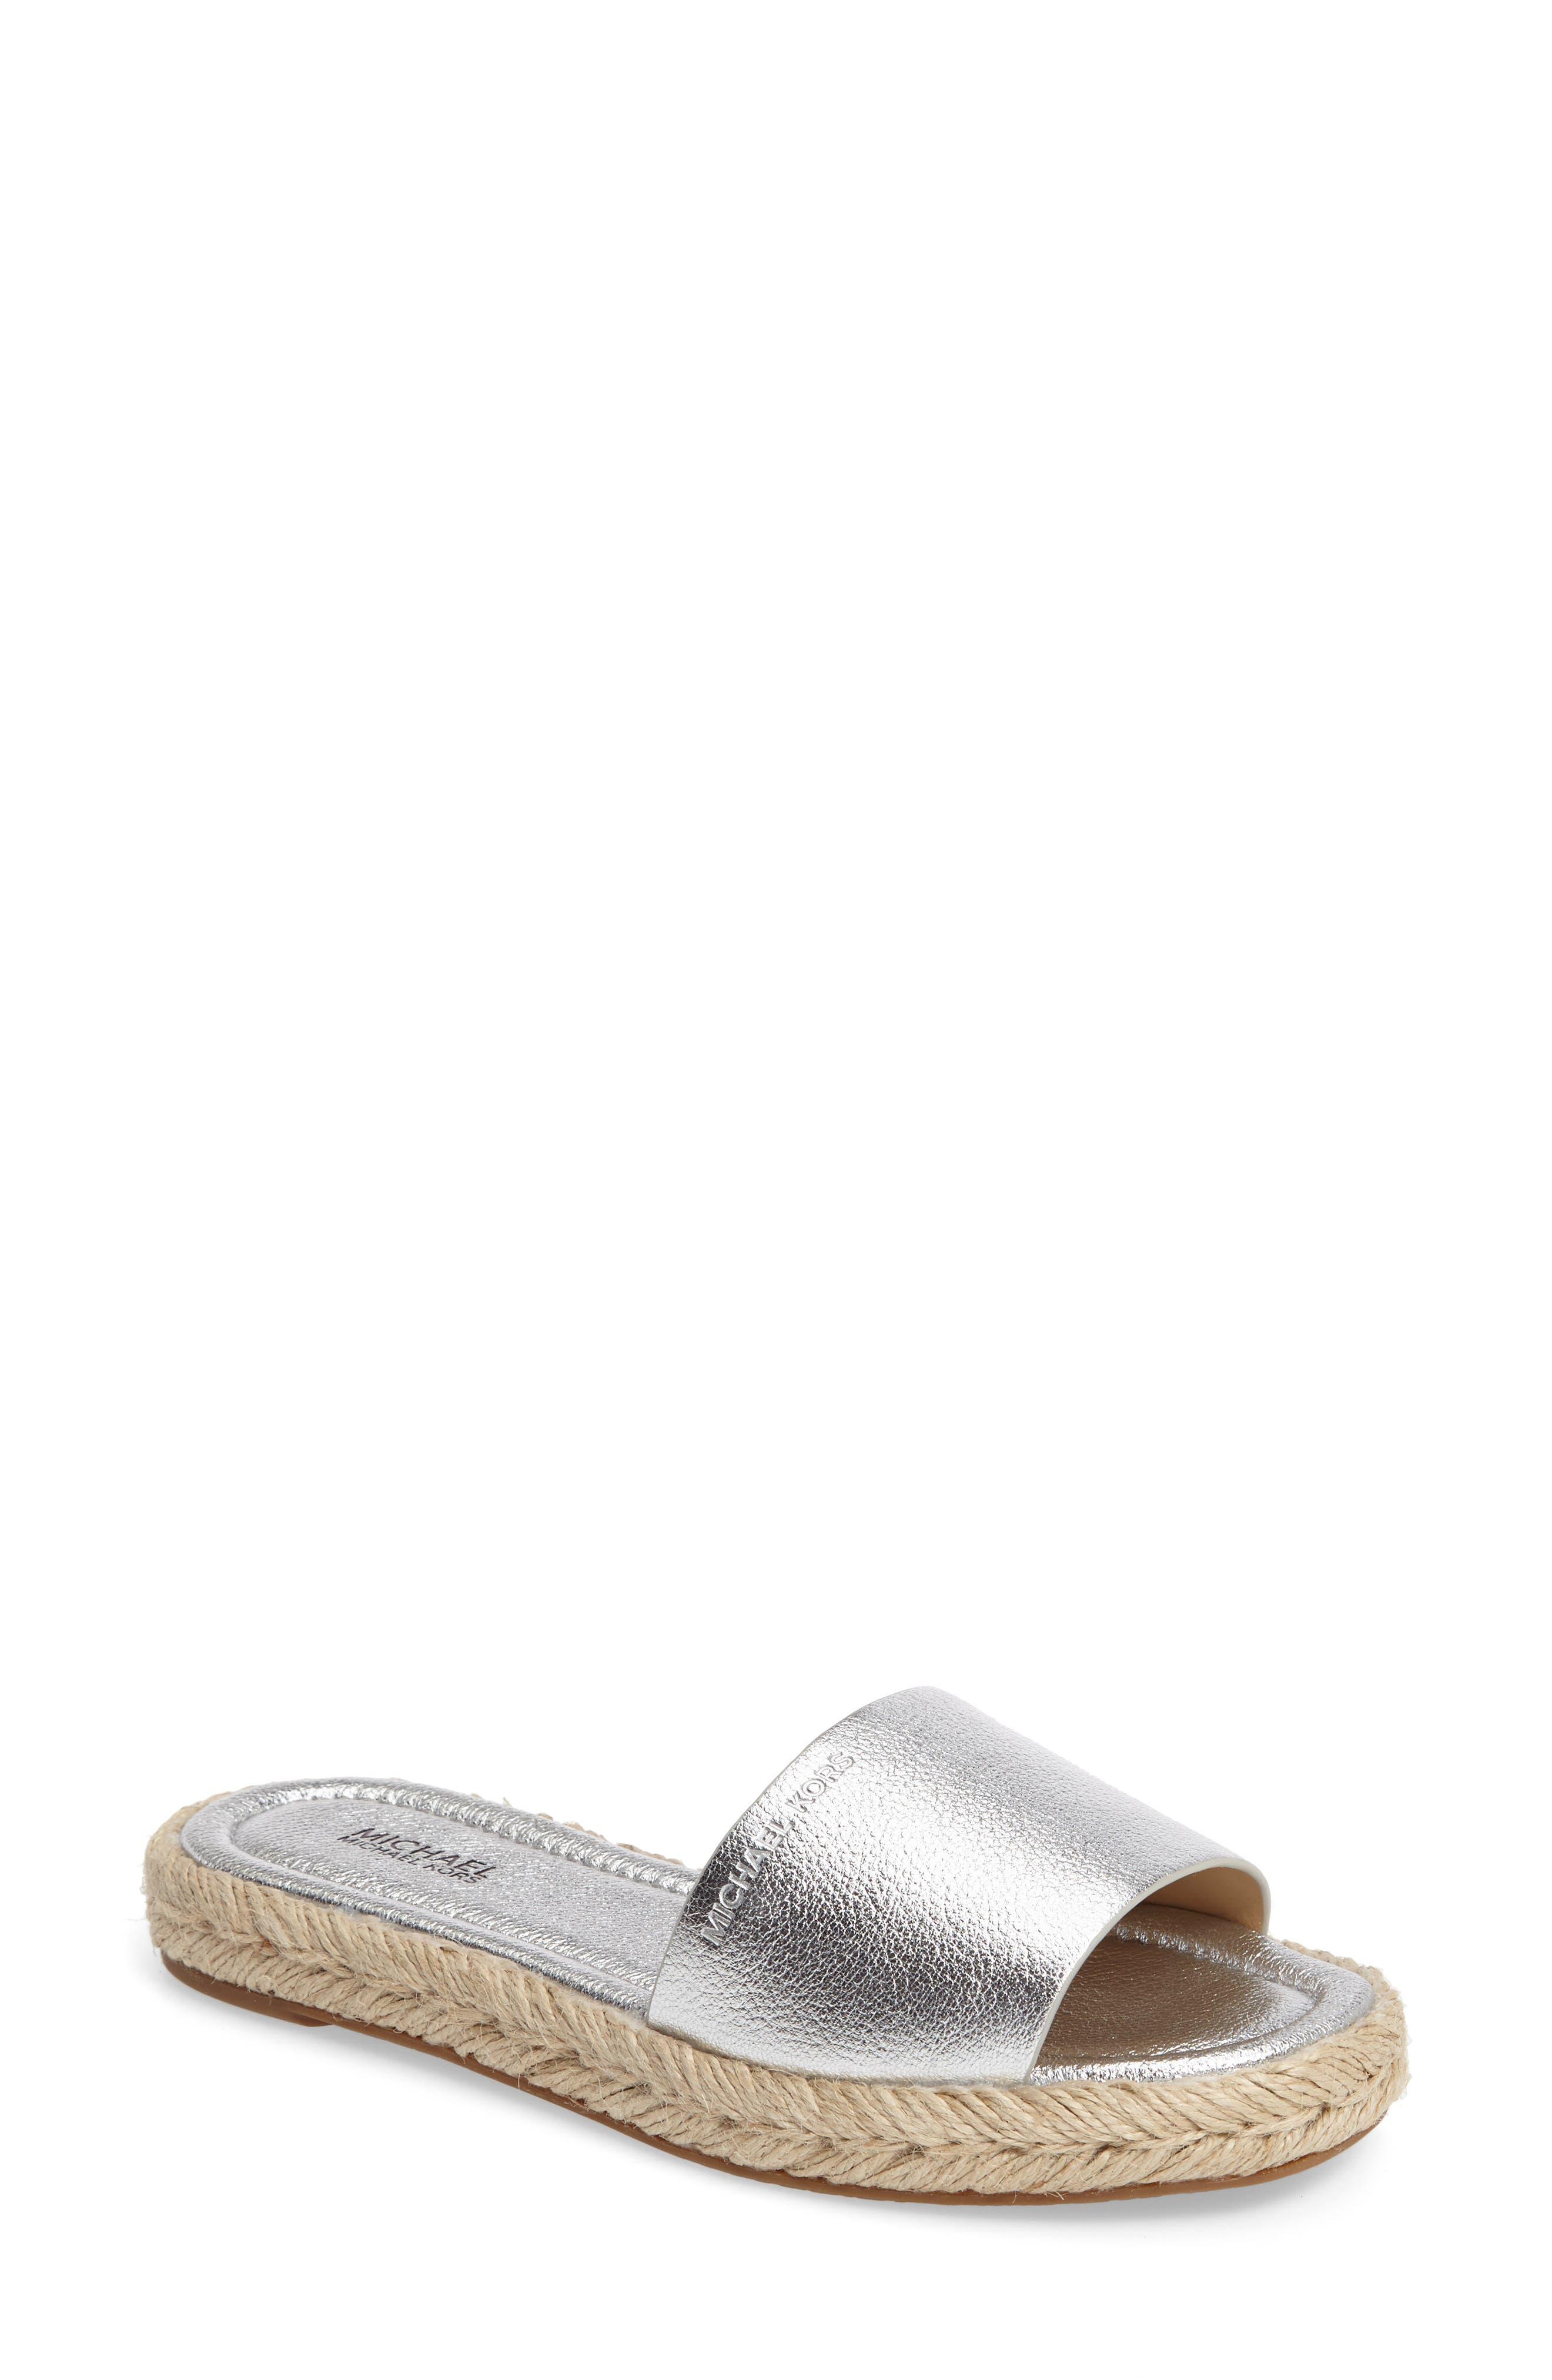 Alternate Image 1 Selected - MICHAEL Michael Kors Dempsey Slide Sandal (Women)